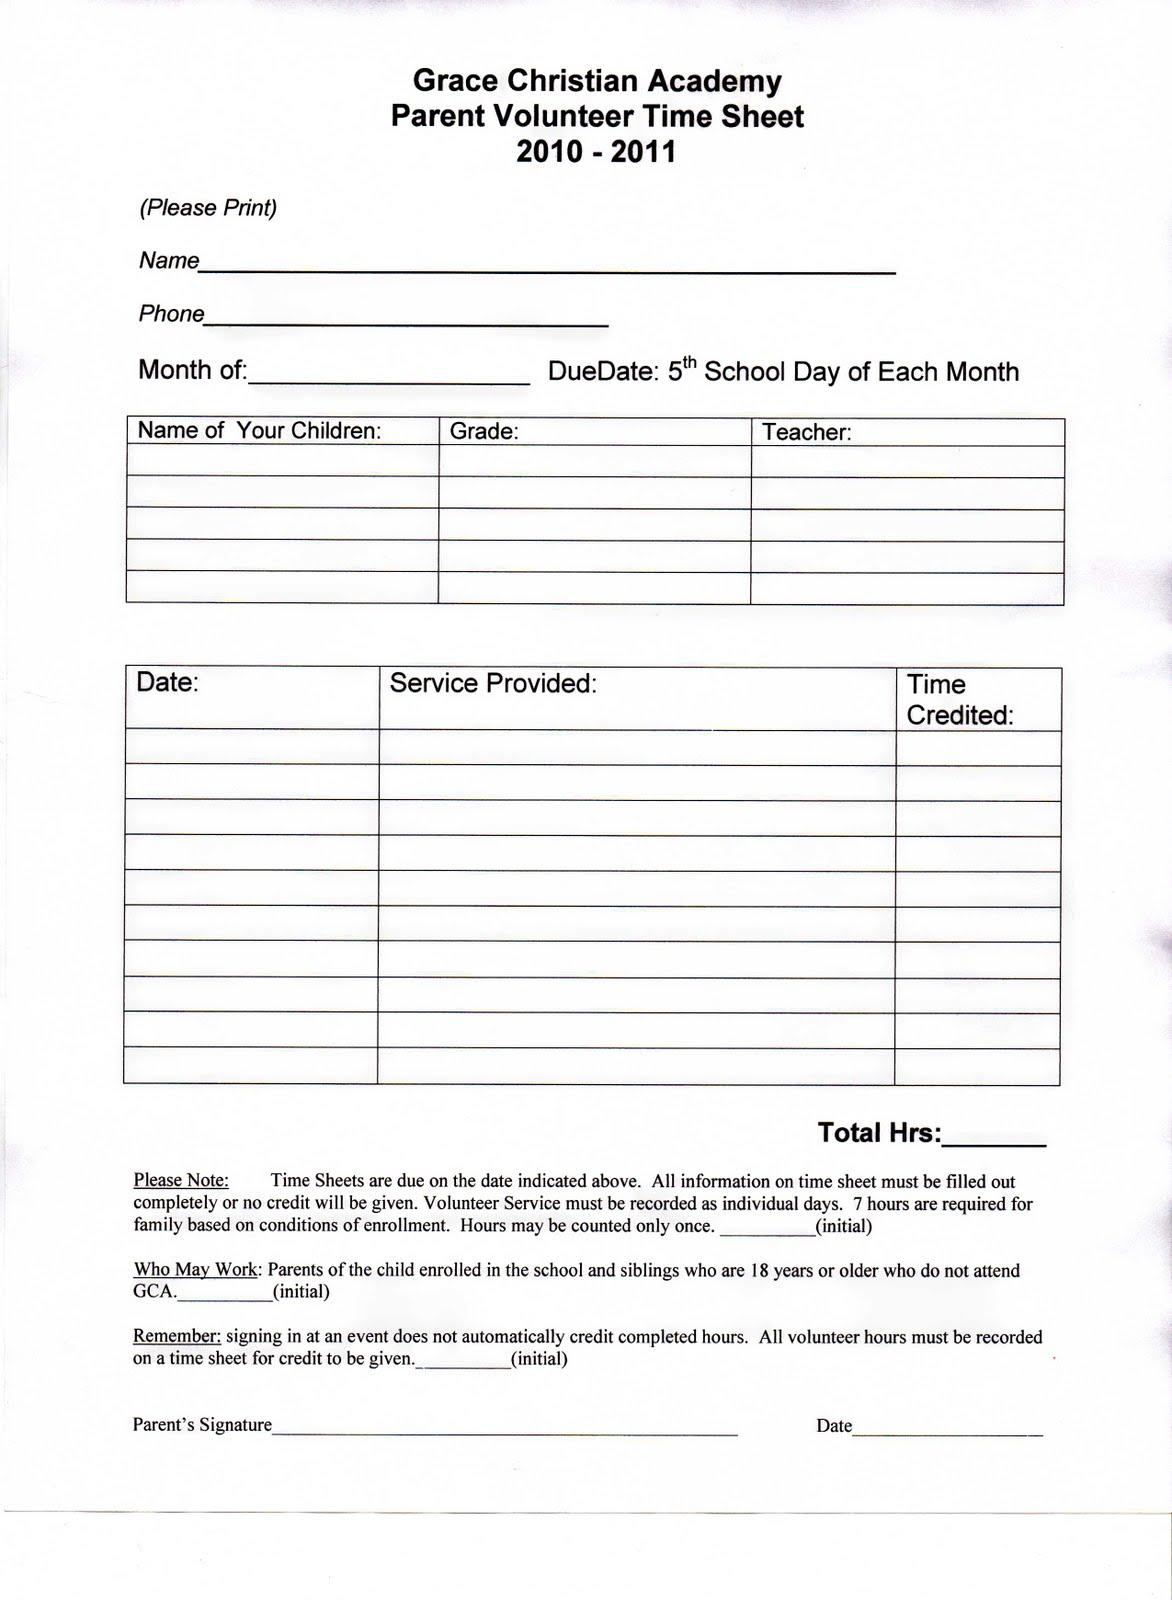 Grace Christian Academy Parent Volunteer Hours Amp Form